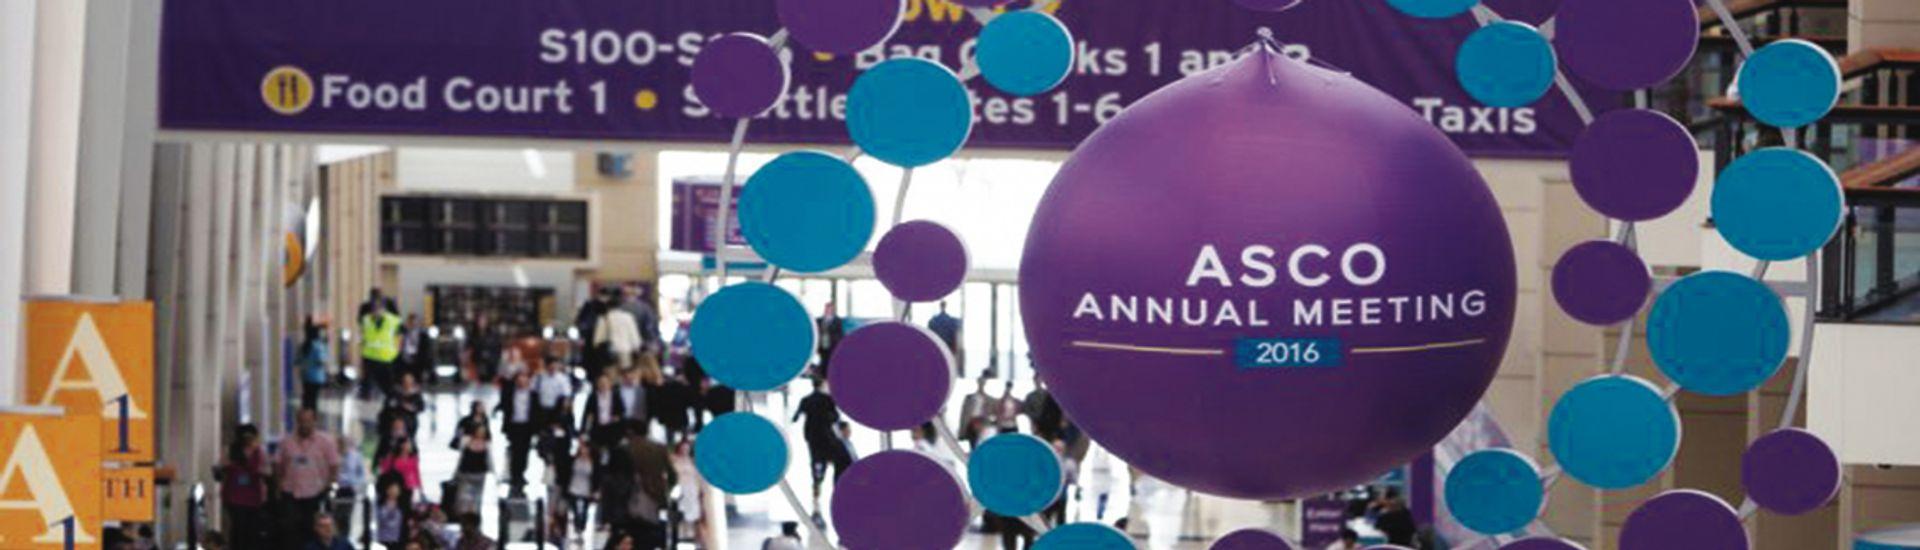 The ASCO Annual Meeting 2016